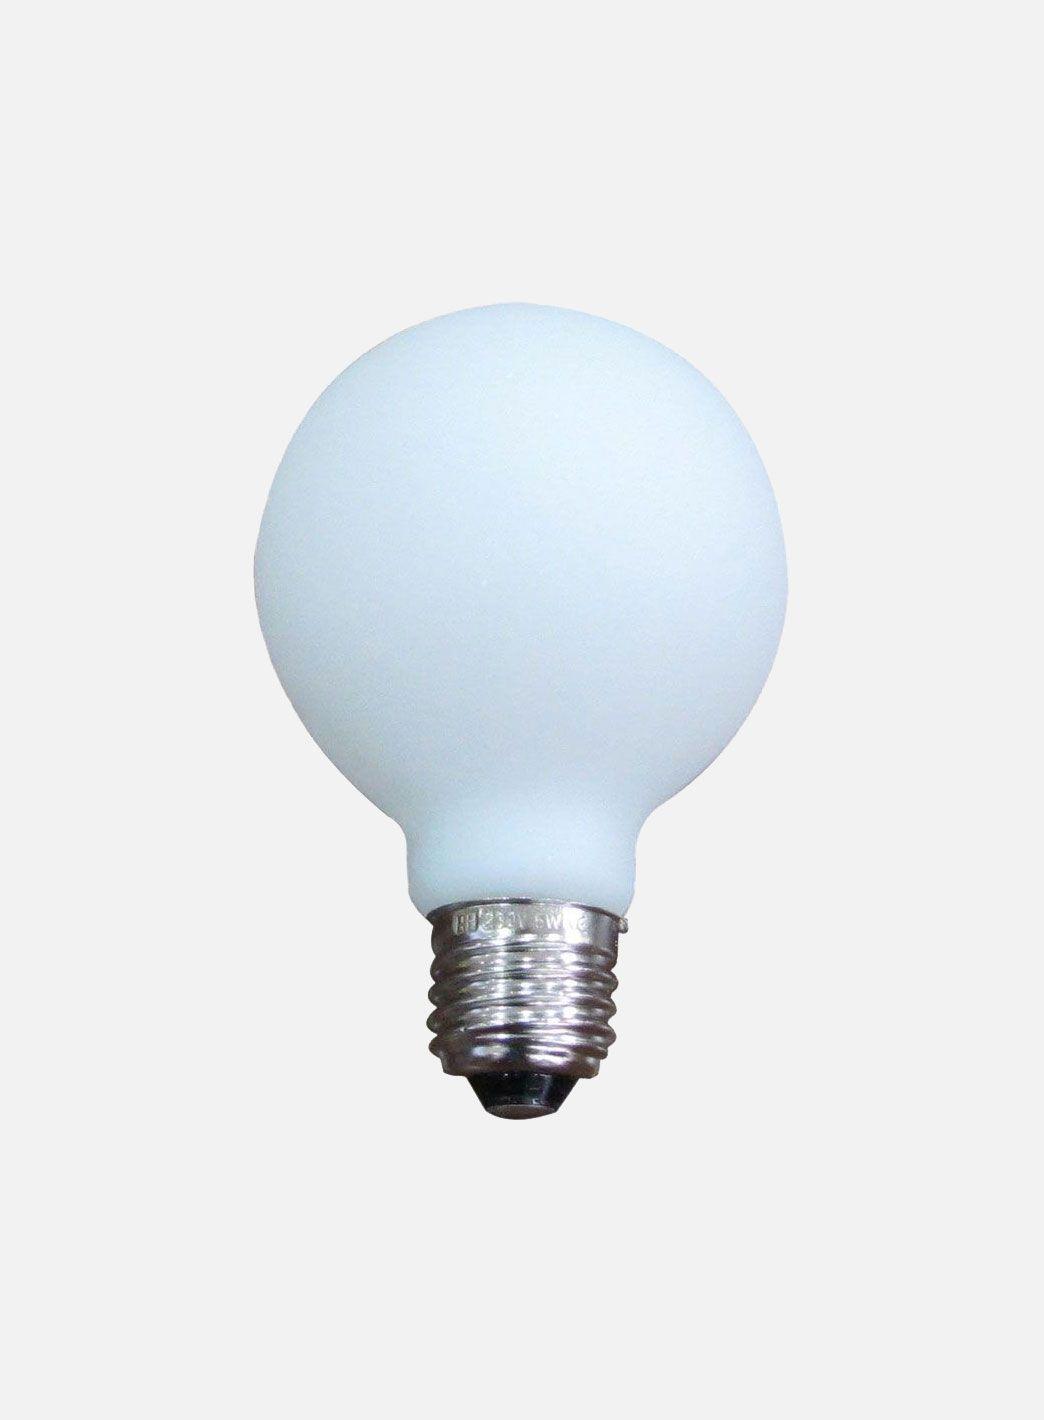 Lampe SIRIUS Led | LED Pærer Belysning | Campingtilbehør4u.no